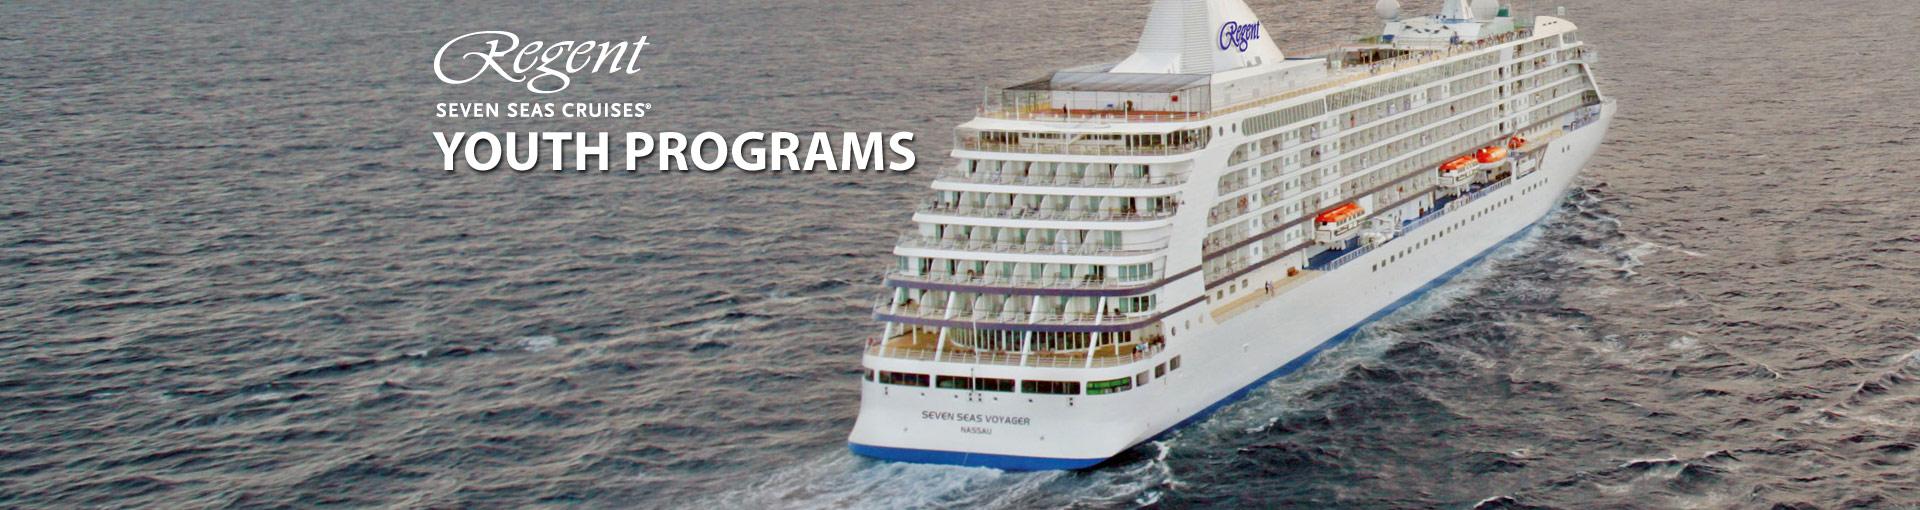 Regent Seven Seas Cruises Youth Programs